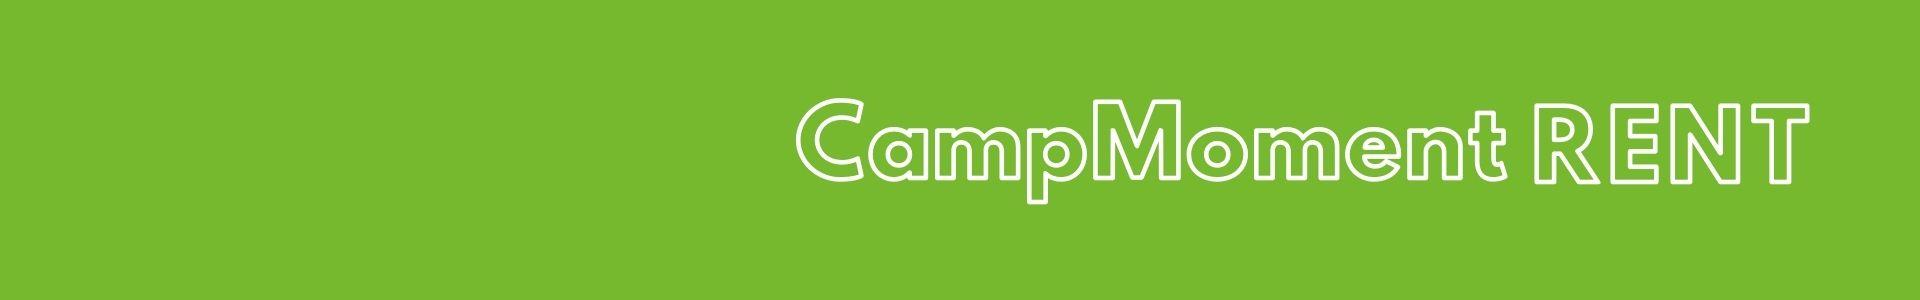 Campmoment Rent Konzept